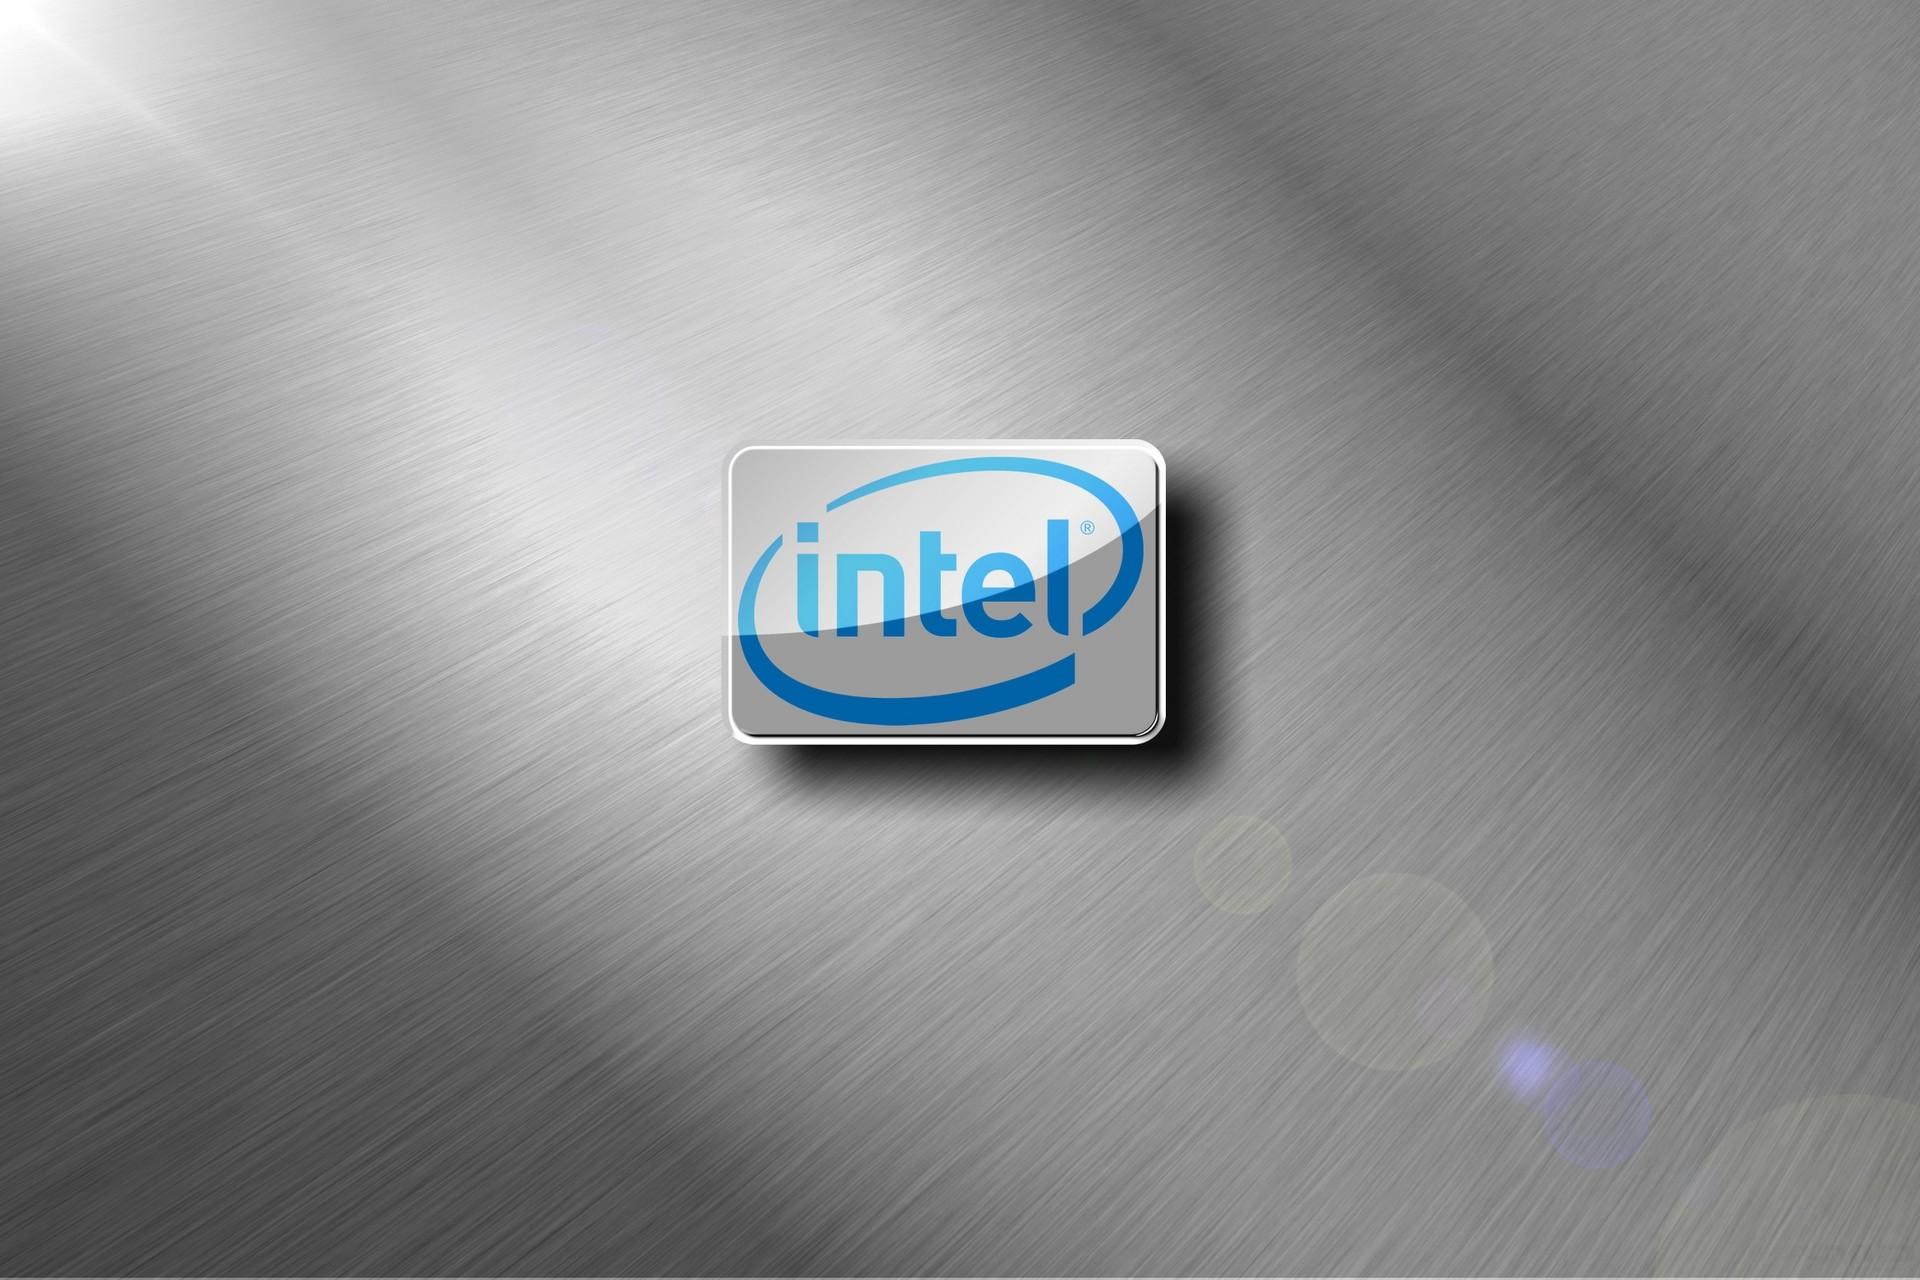 Intel Brushed Metal Chrome